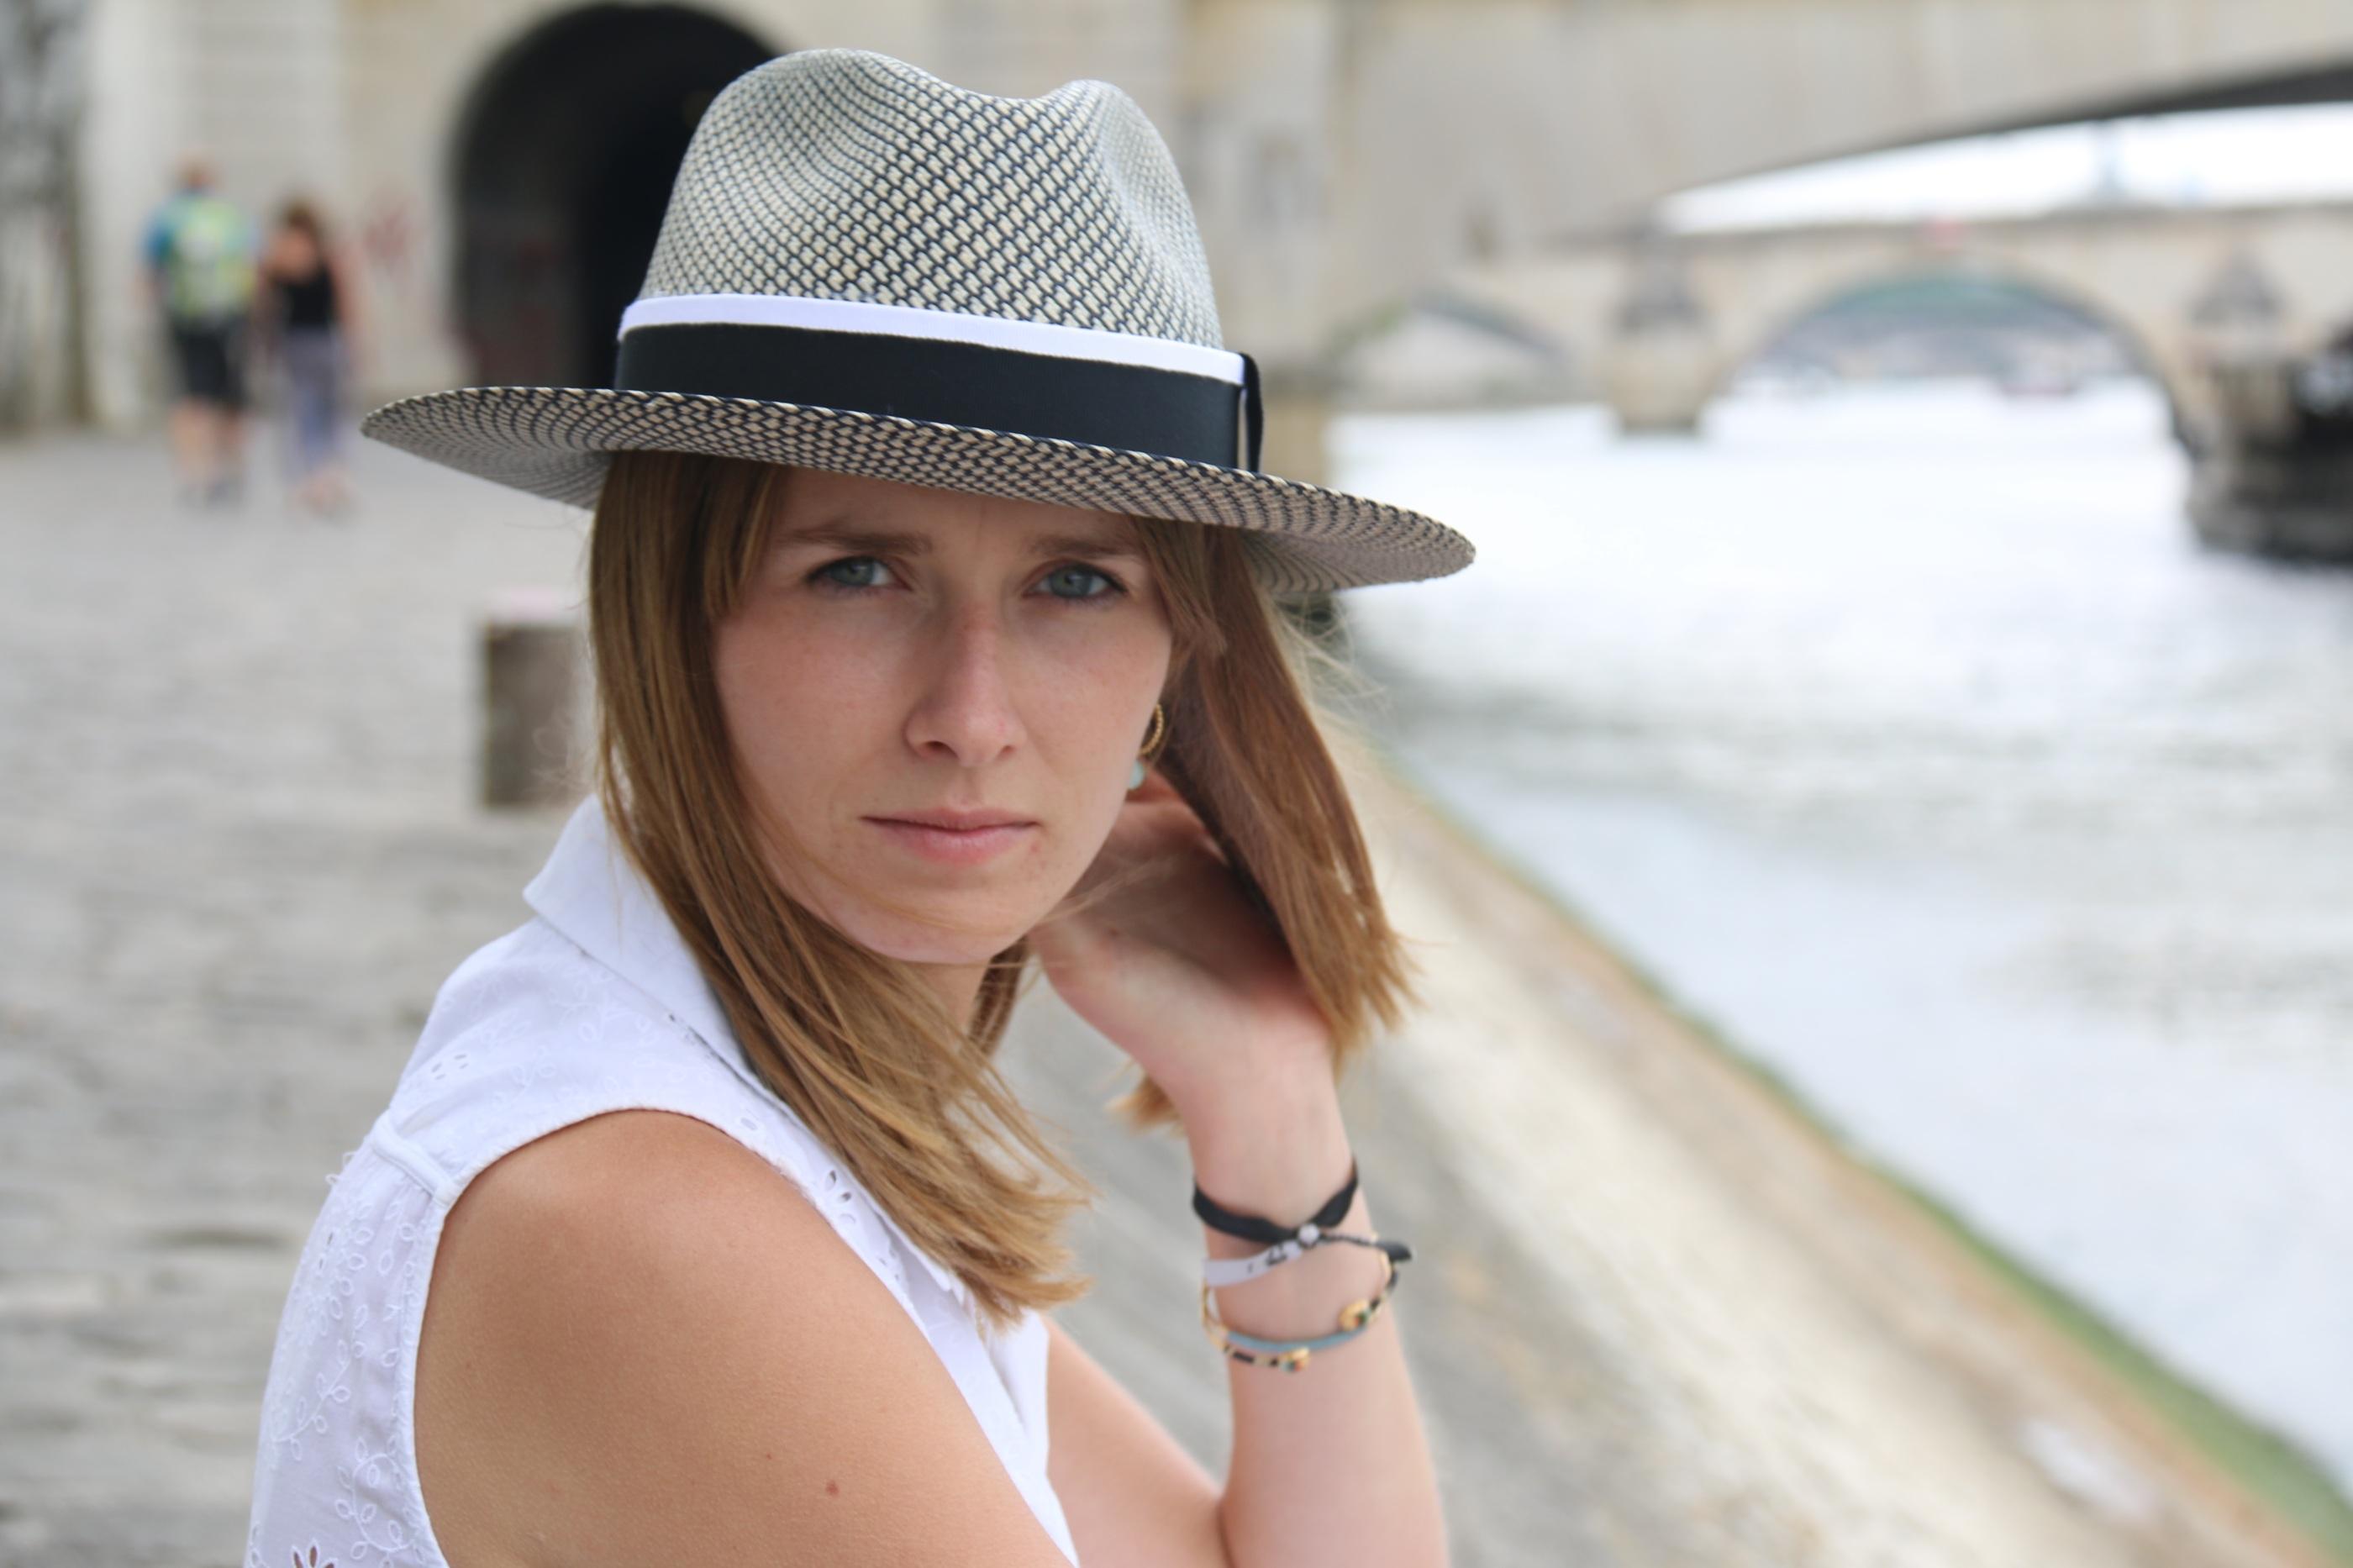 chapeau-panama-capferret-7-1800x1200